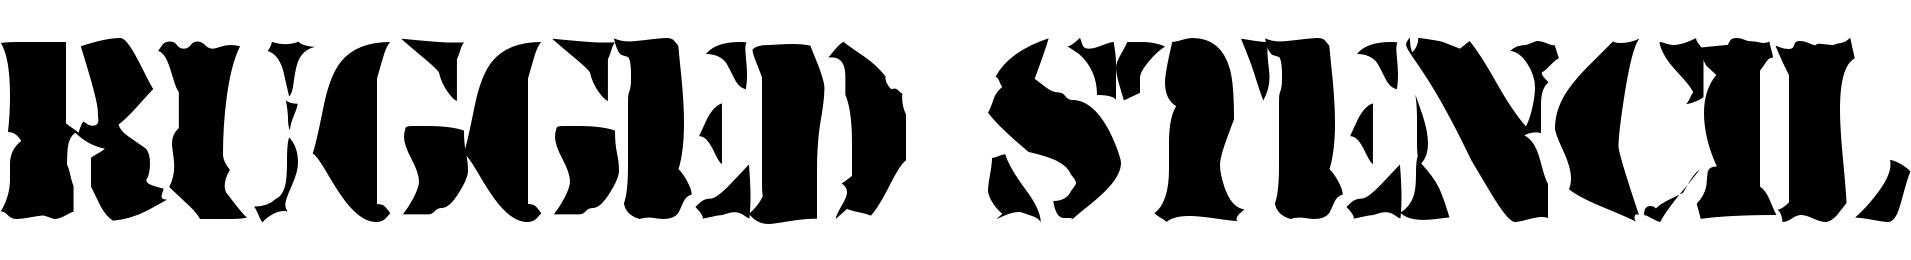 Rugged Stencil